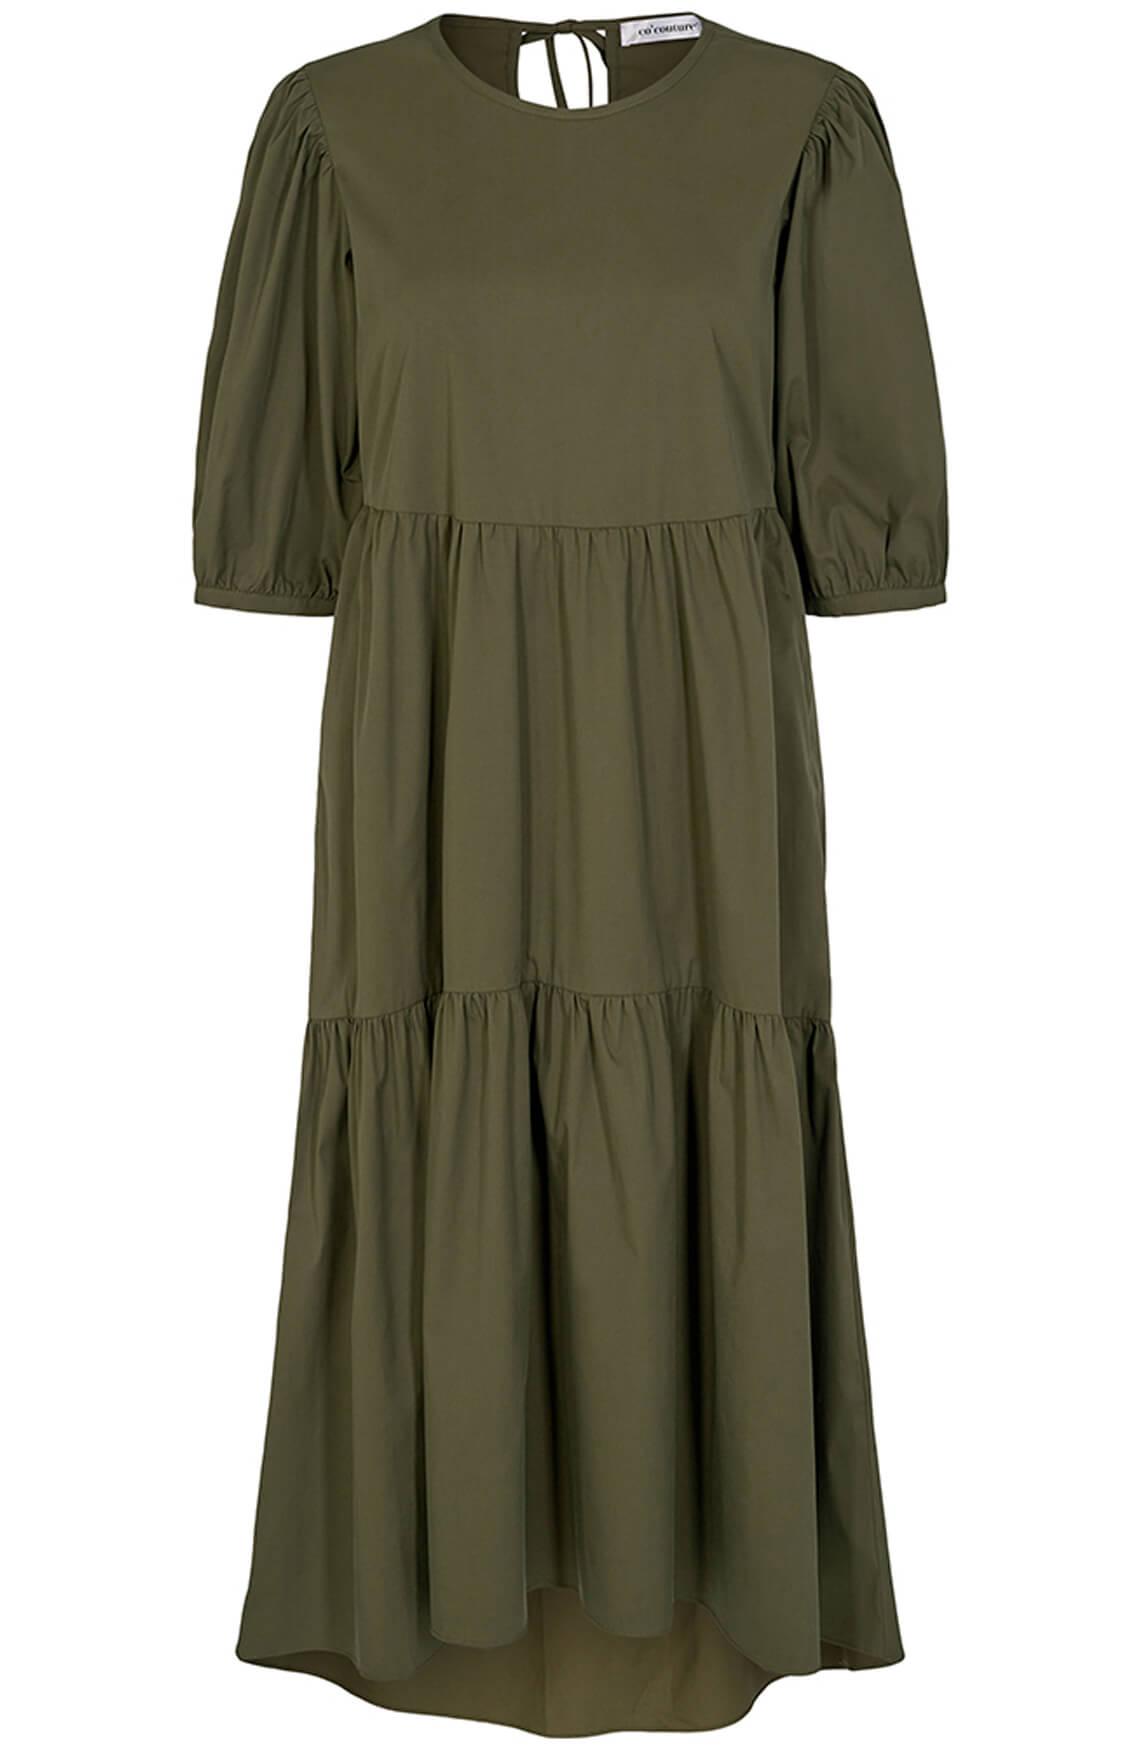 Co Couture Dames Cecilie poplin jurk groen